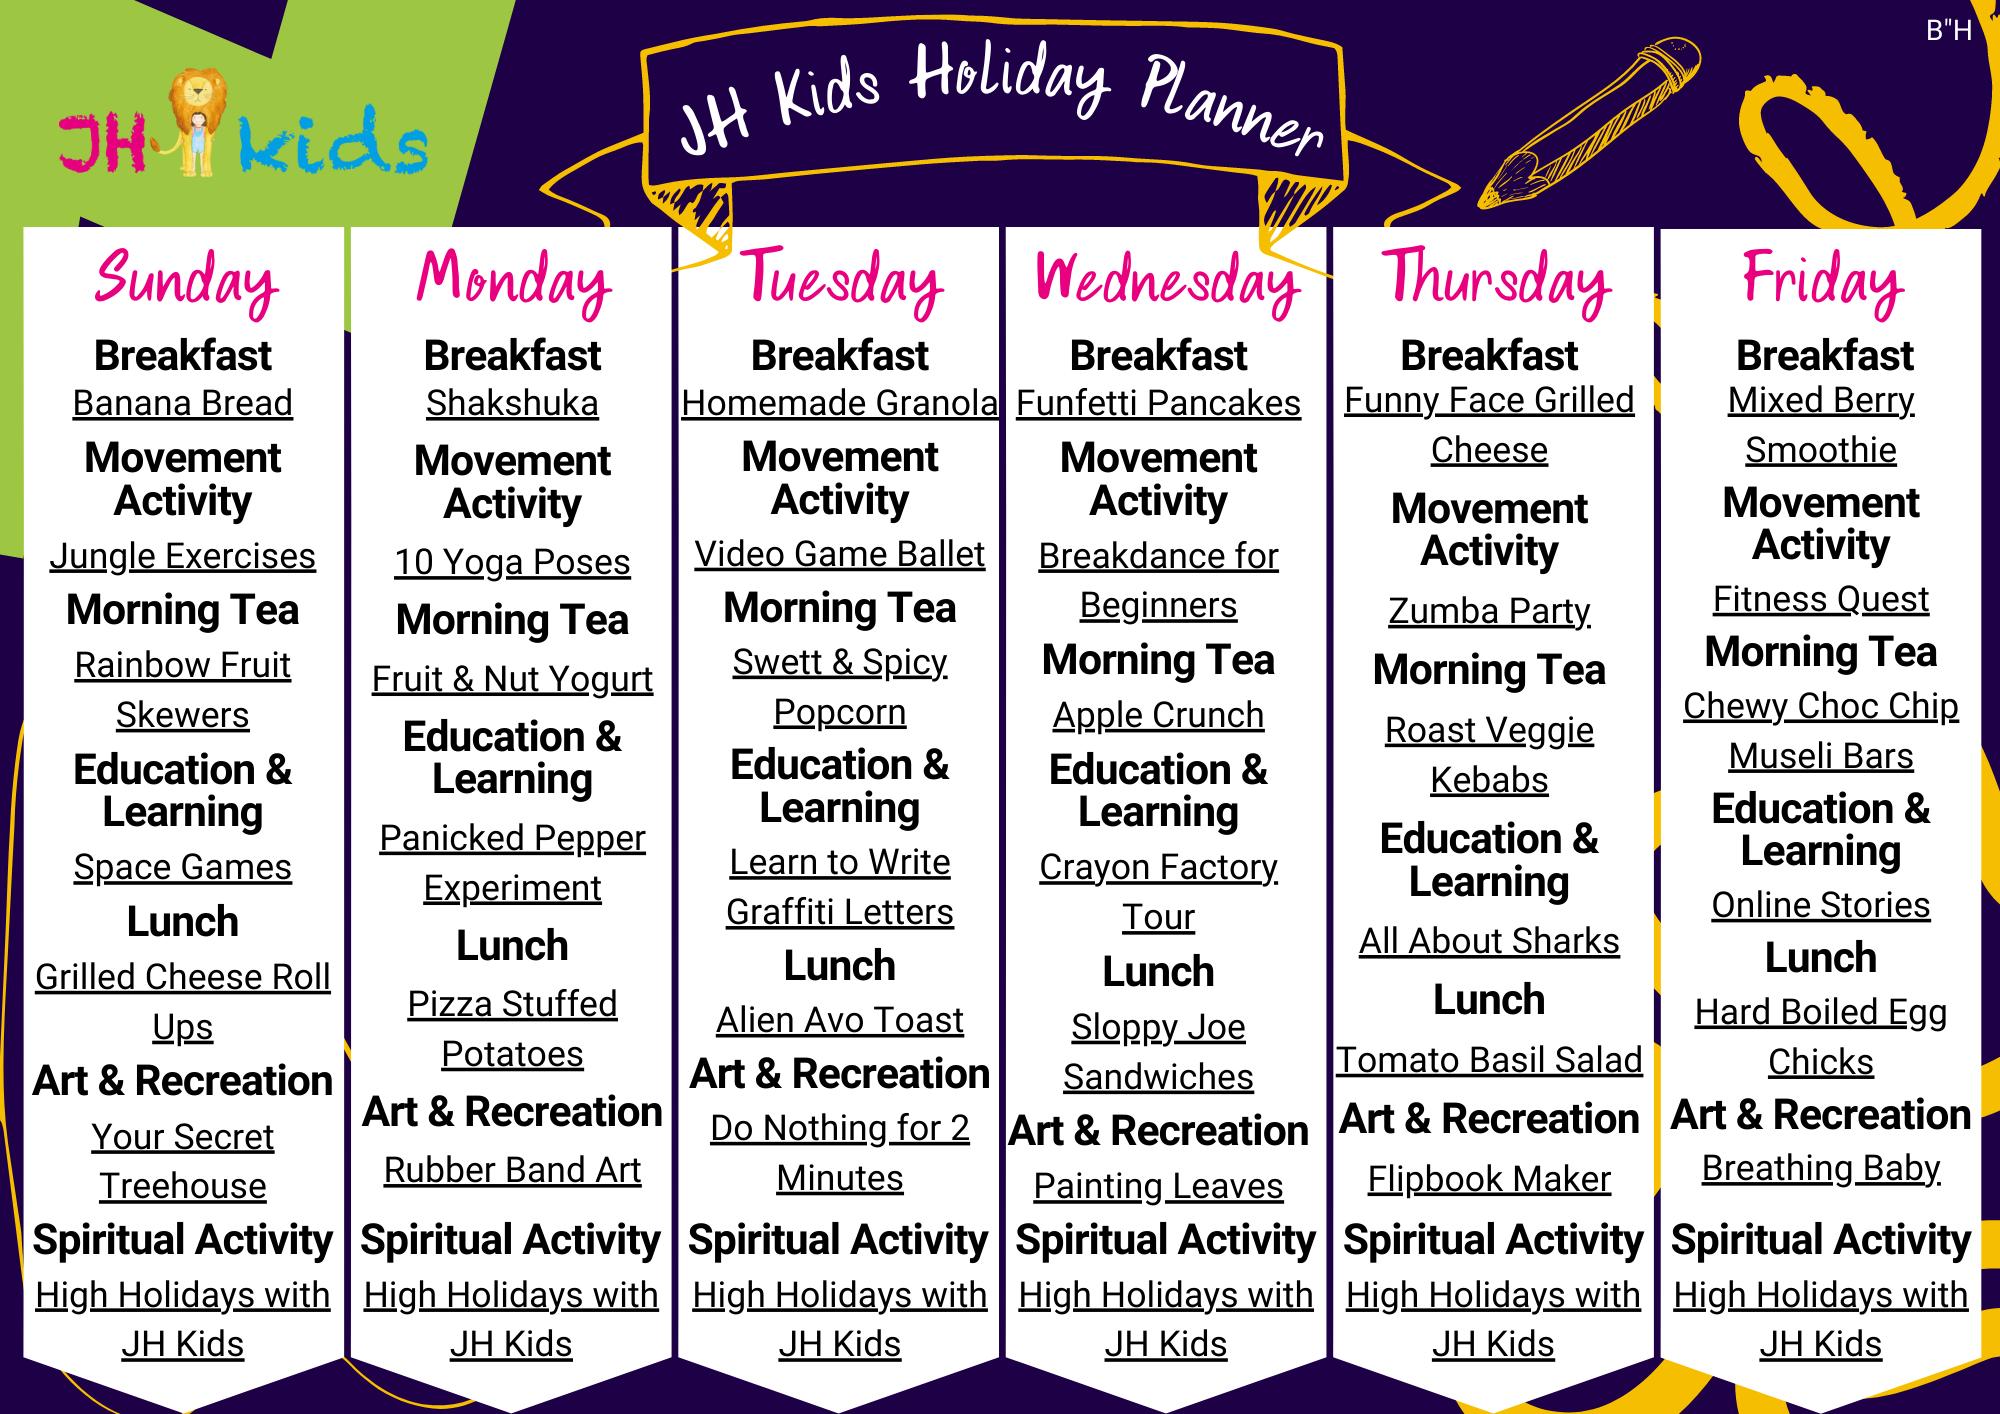 JH Kids Holiday Planner PURPLE